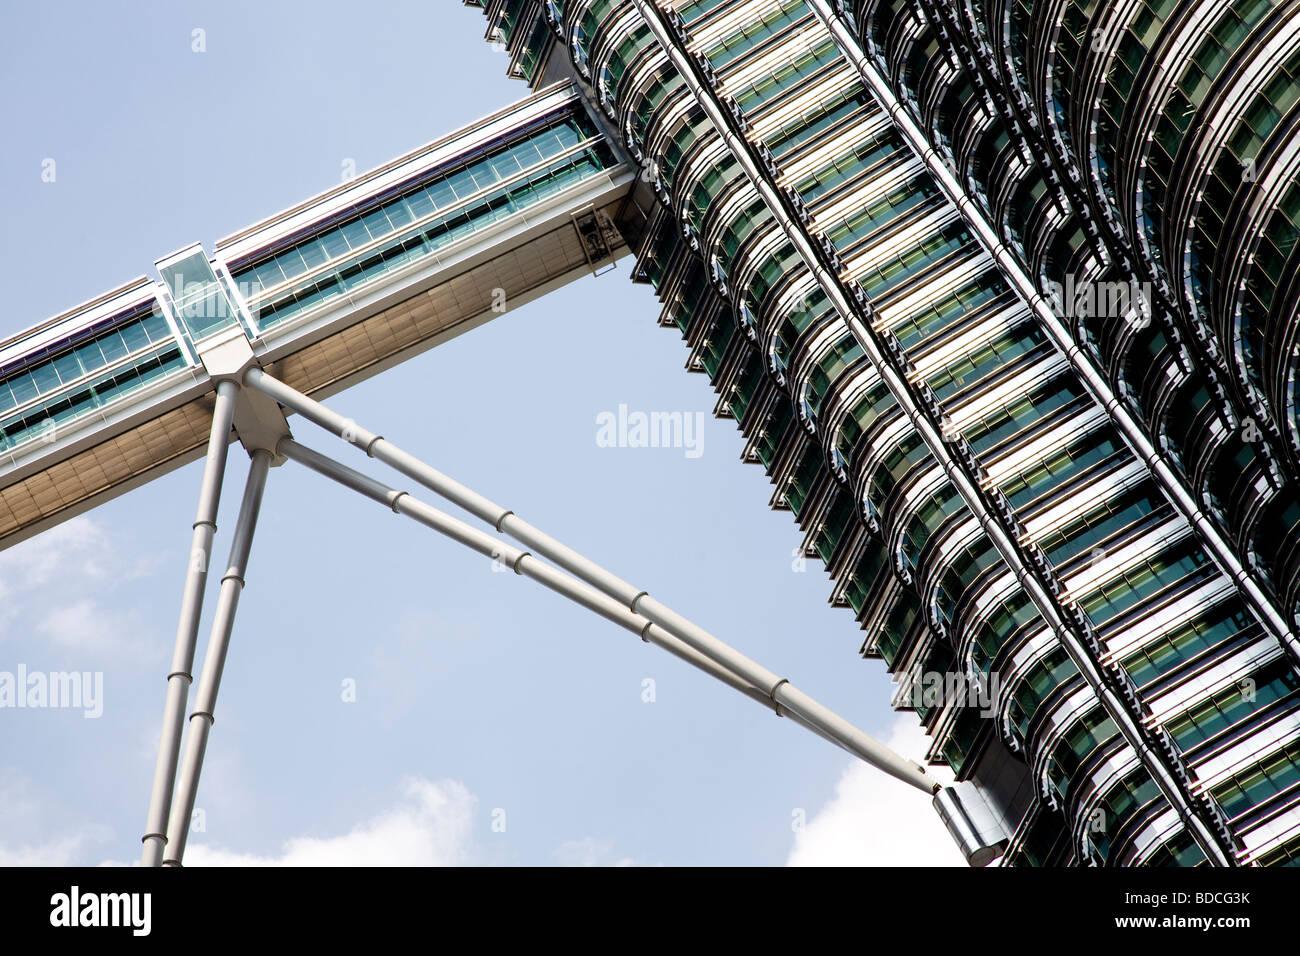 Torres Petronas, Kuala Lumpur, Malasia Imagen De Stock